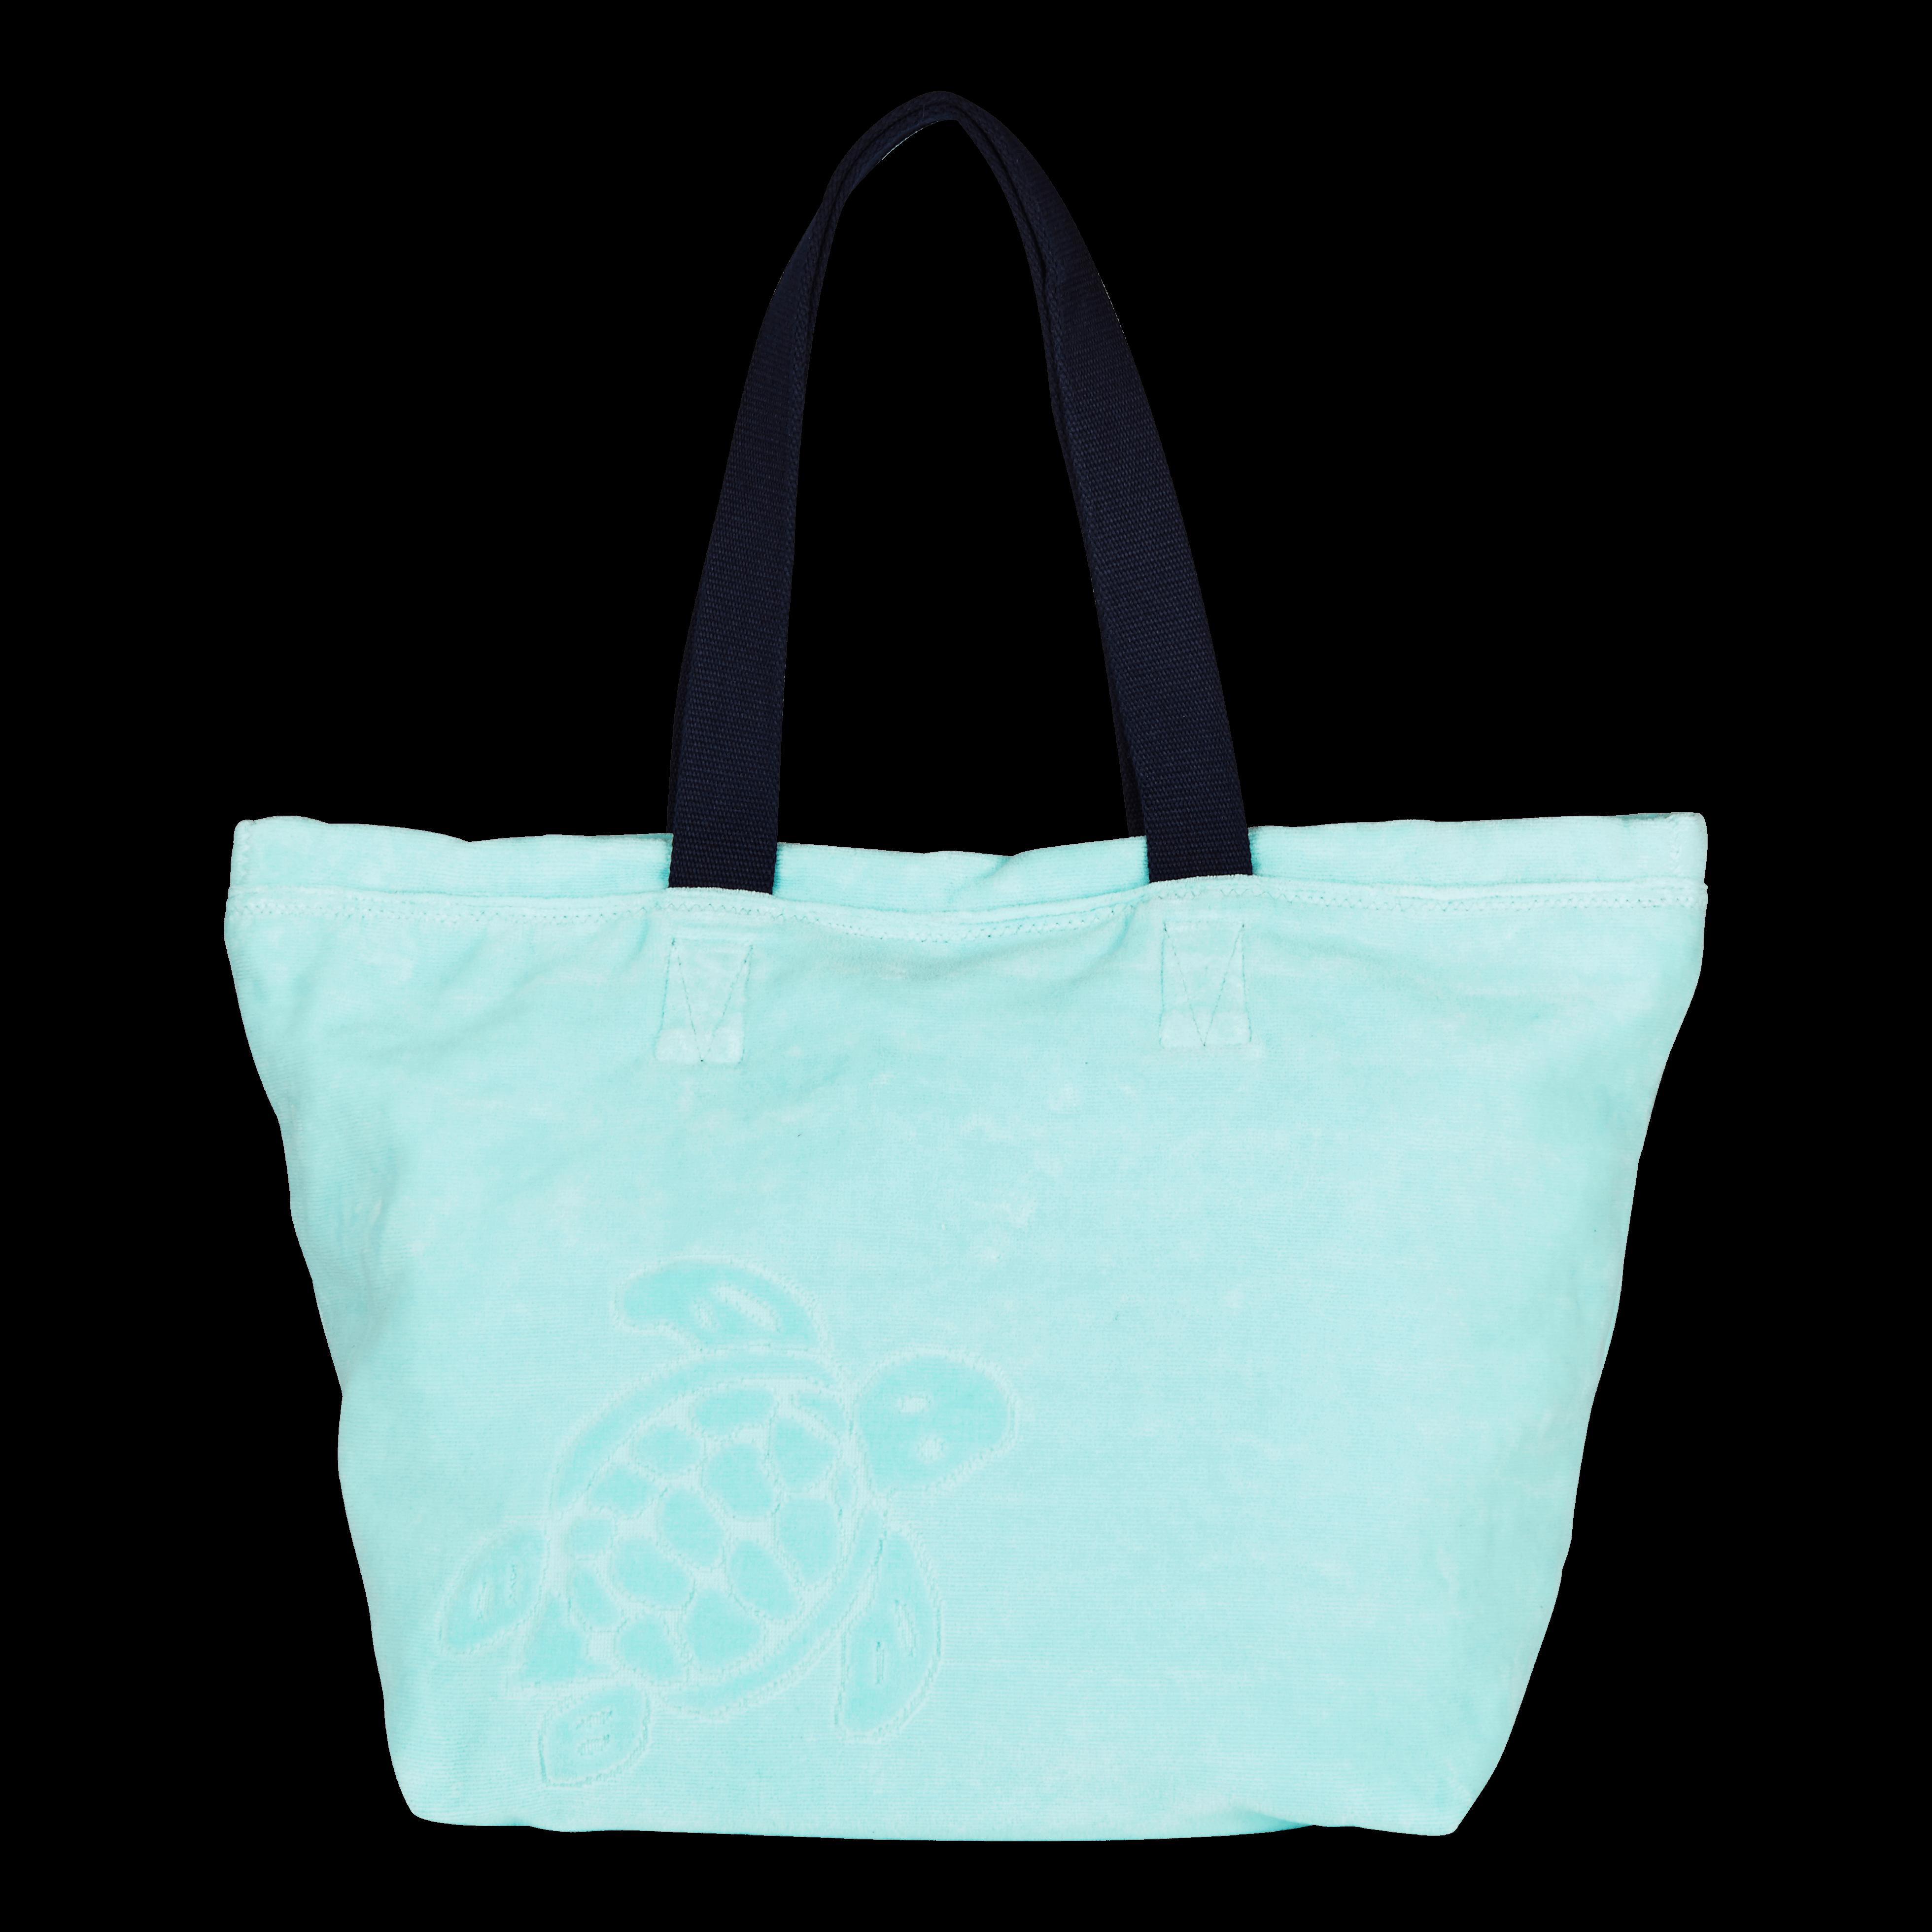 c4b30f43e3 VILEBREQUIN MEN ACCESSORIES - LARGE TERRY CLOTH BEACH BAG SOLID JACQUARD - BEACH  BAG - BARNEY. #vilebrequin #bags #velvet #travel bags #beach #cotton